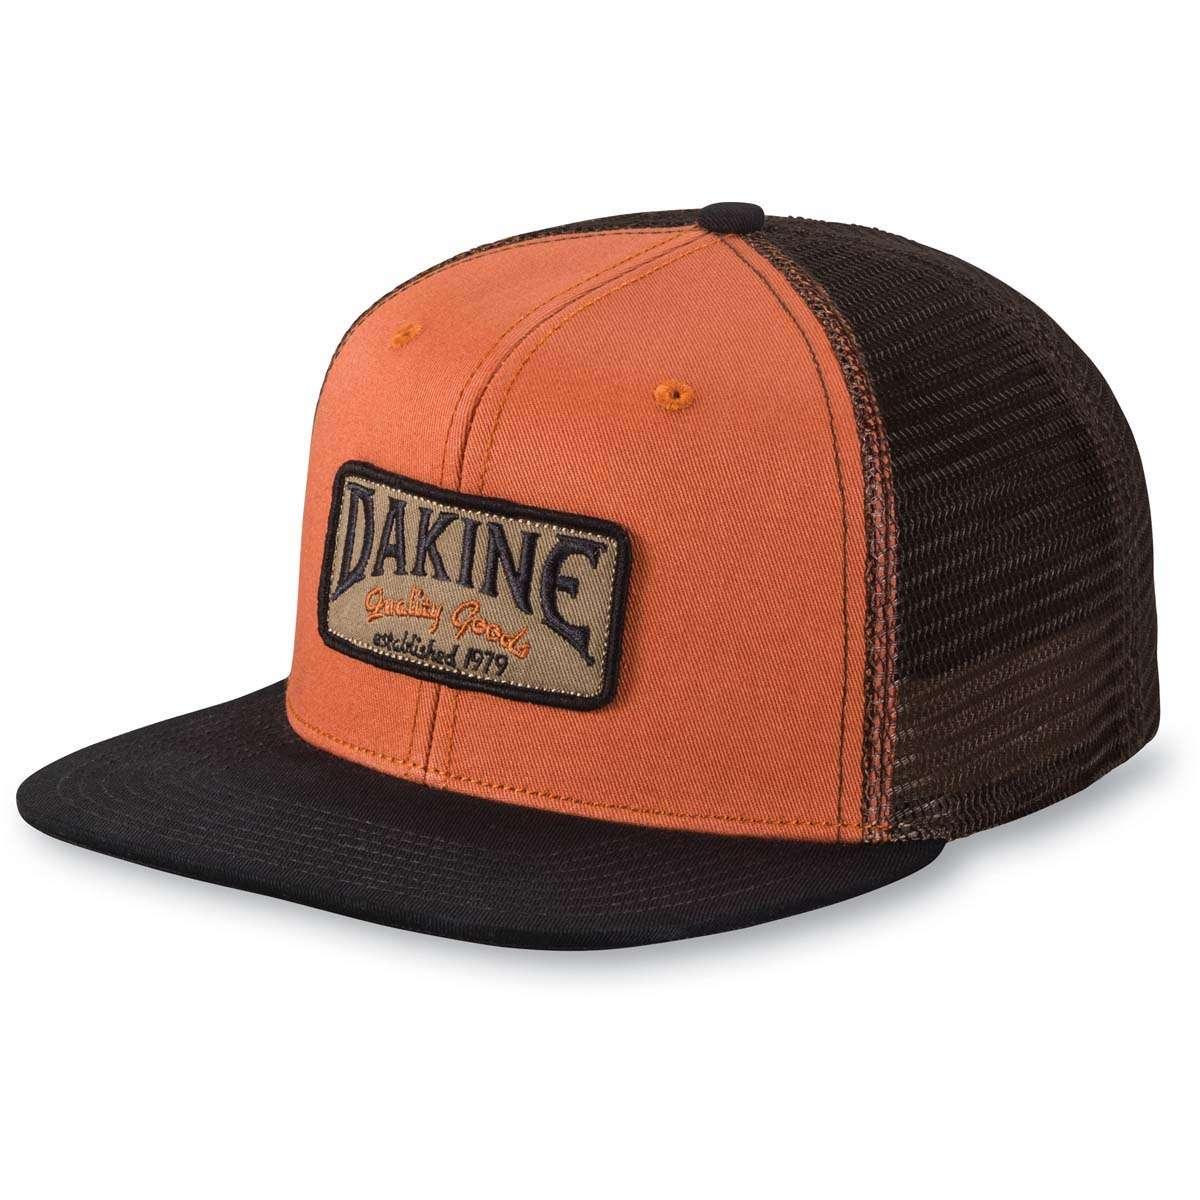 6b243406d01 Dakine Archie Trucker Cap Ginger   Black